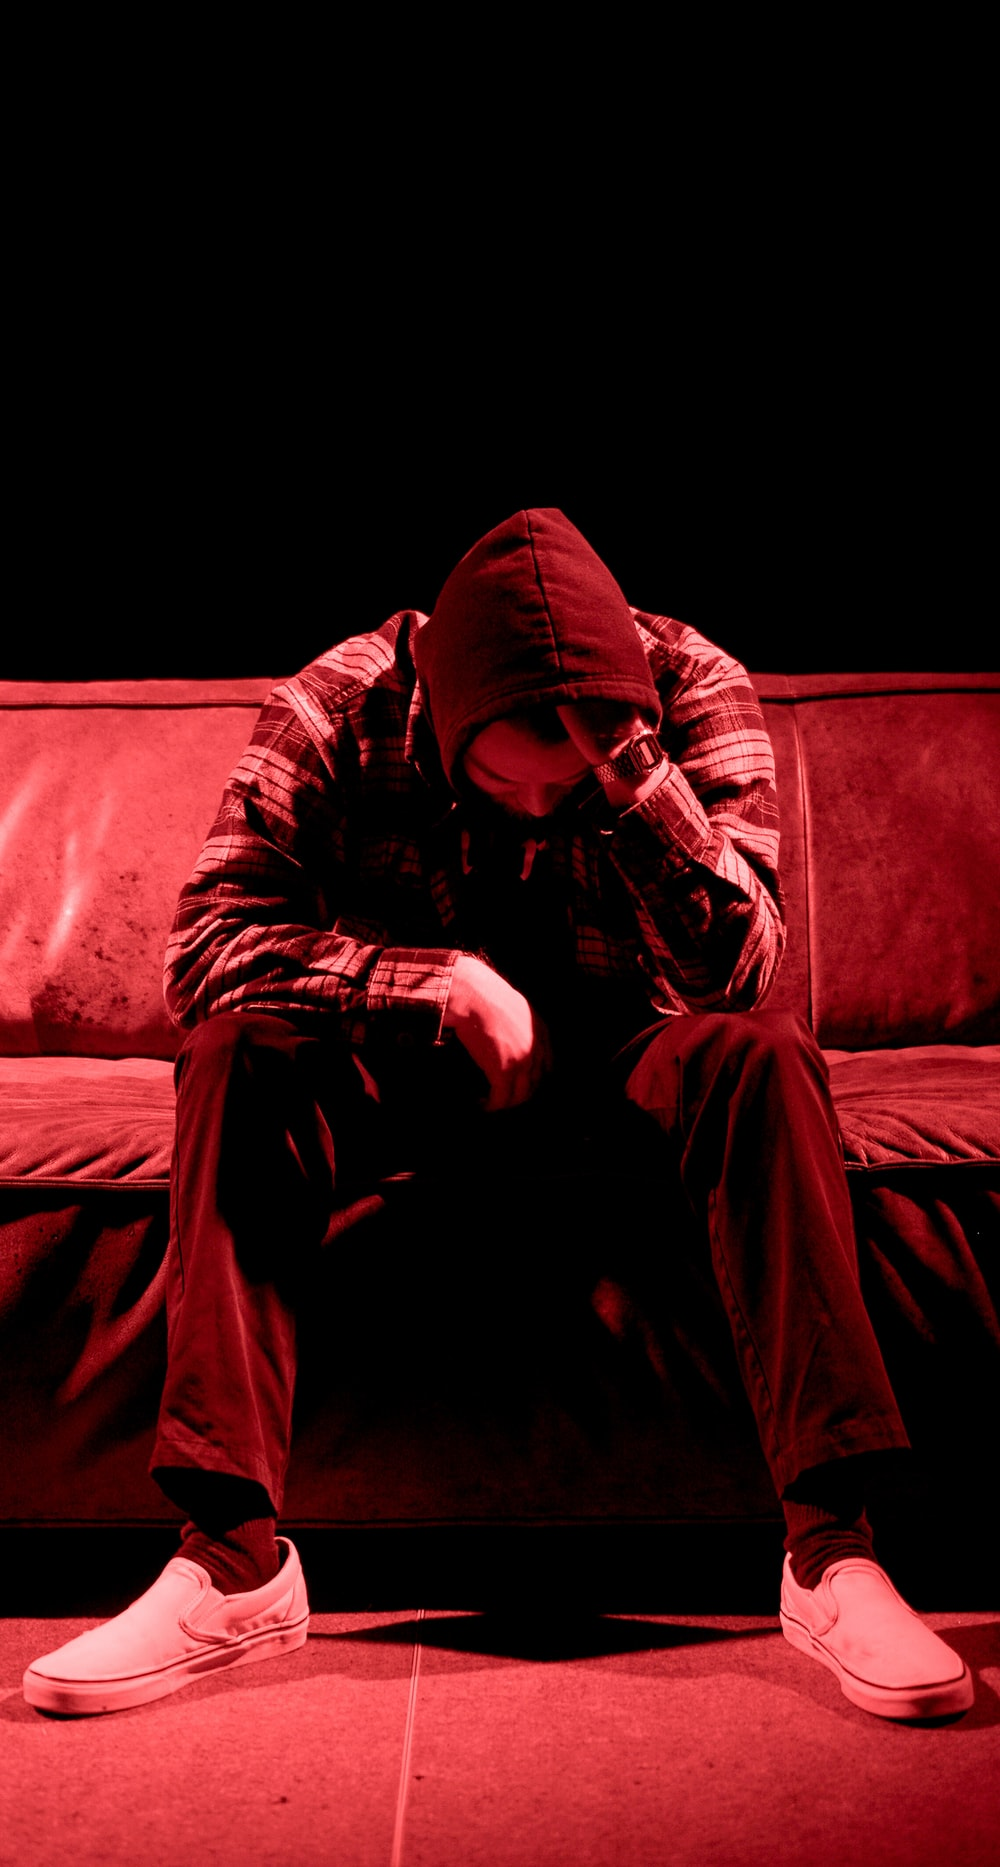 man wearing grey hooded jacket sitting on the sofa photography